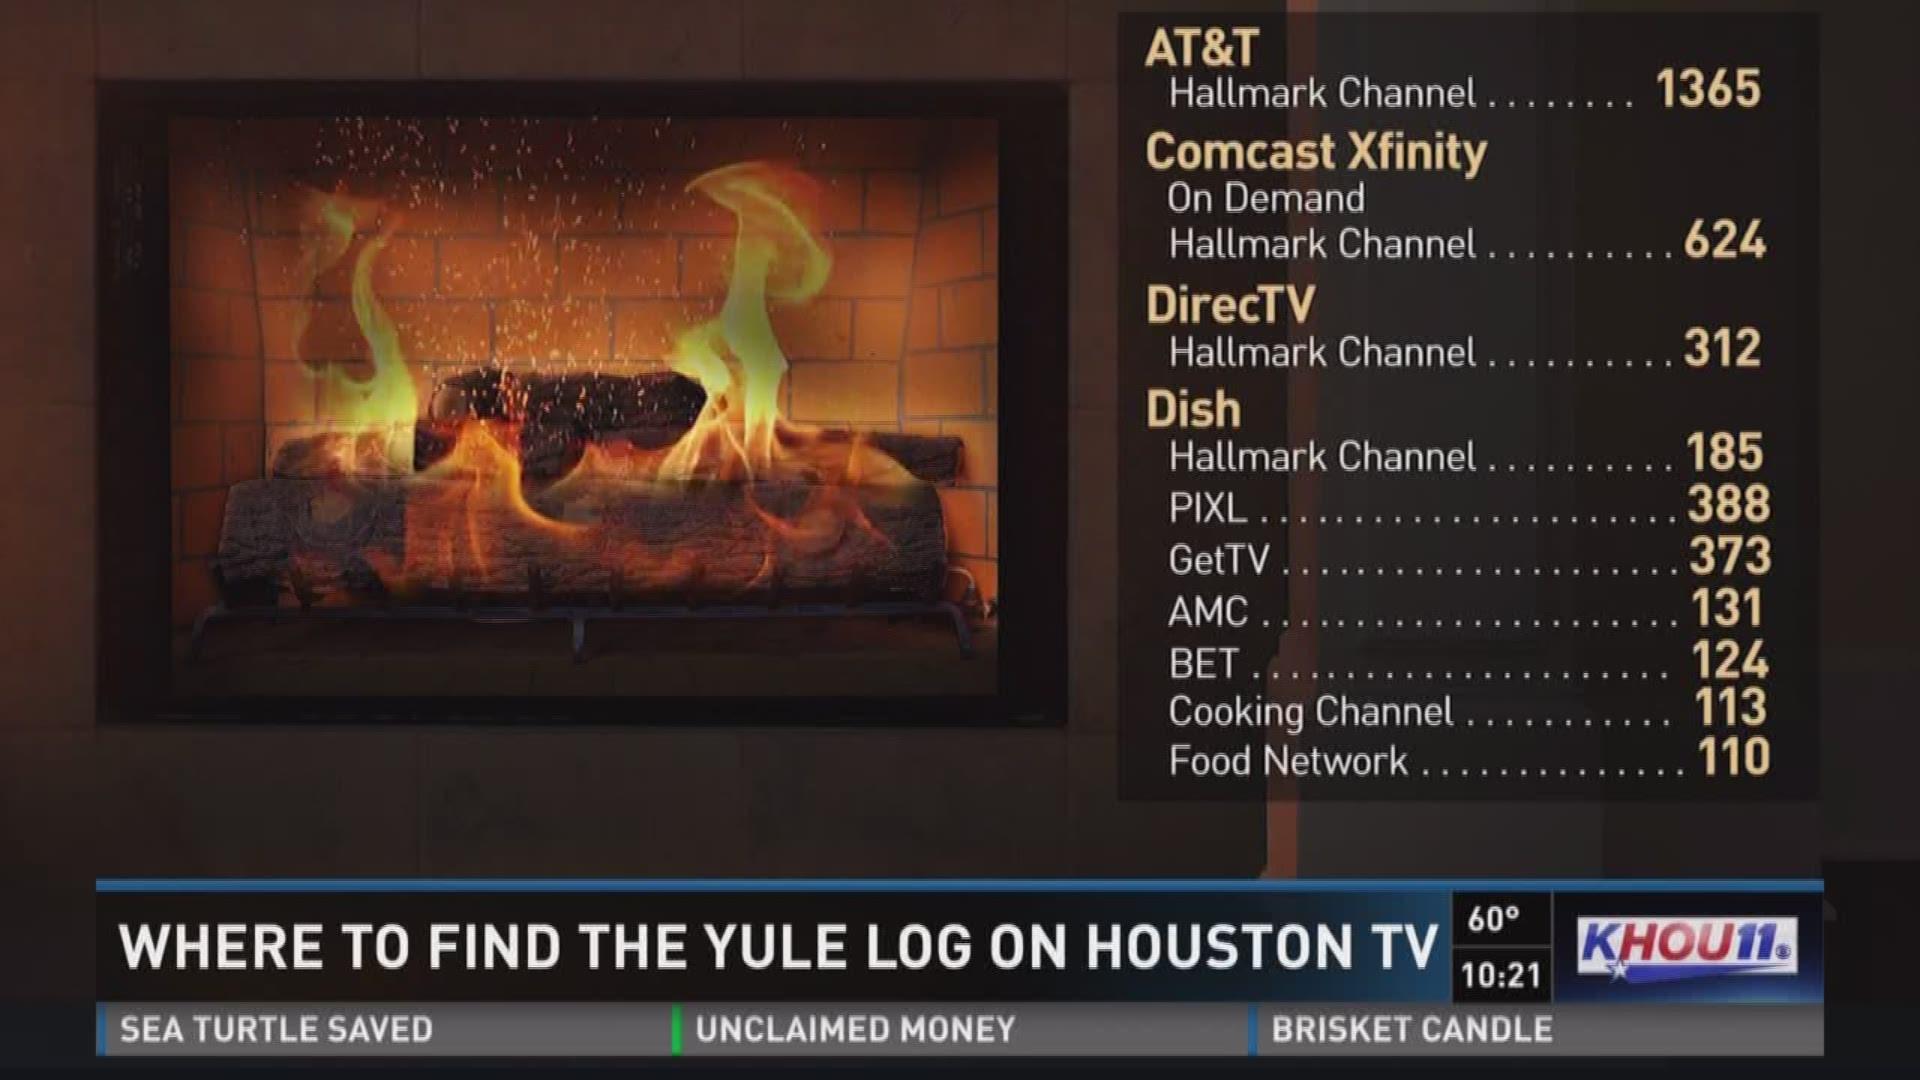 Where To Find The Yule Log On Houston Tv Khou Com